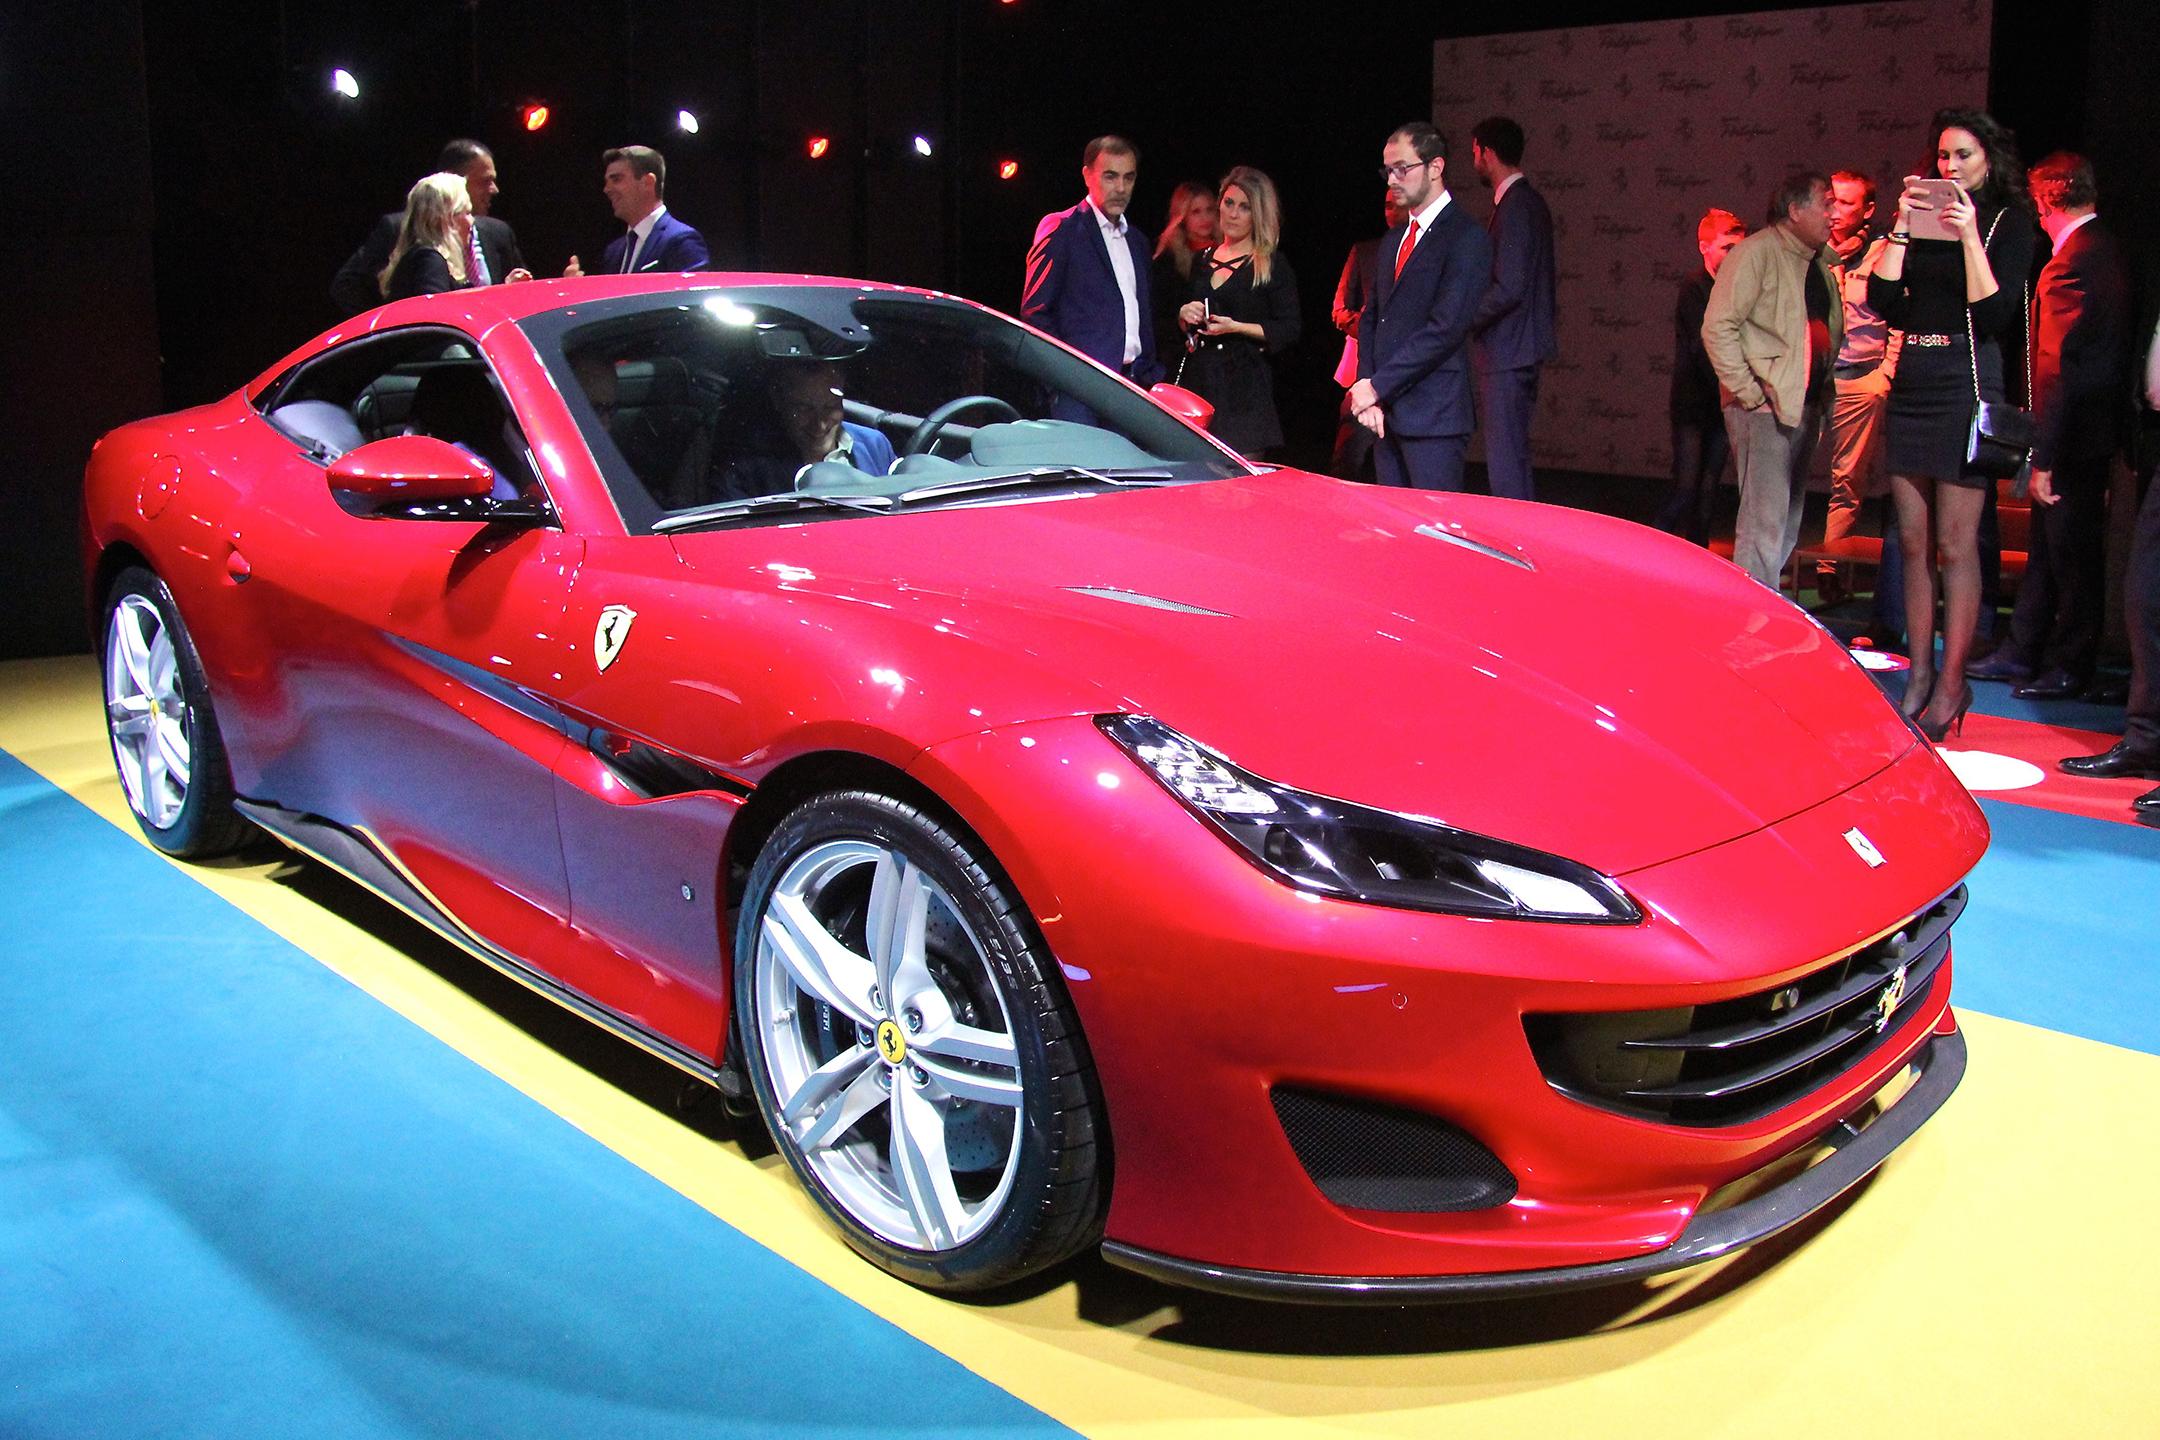 Ferrari Portofino - 2017 - front side-face / profil - présentation Ferrari France - photo Ludo Ferrari